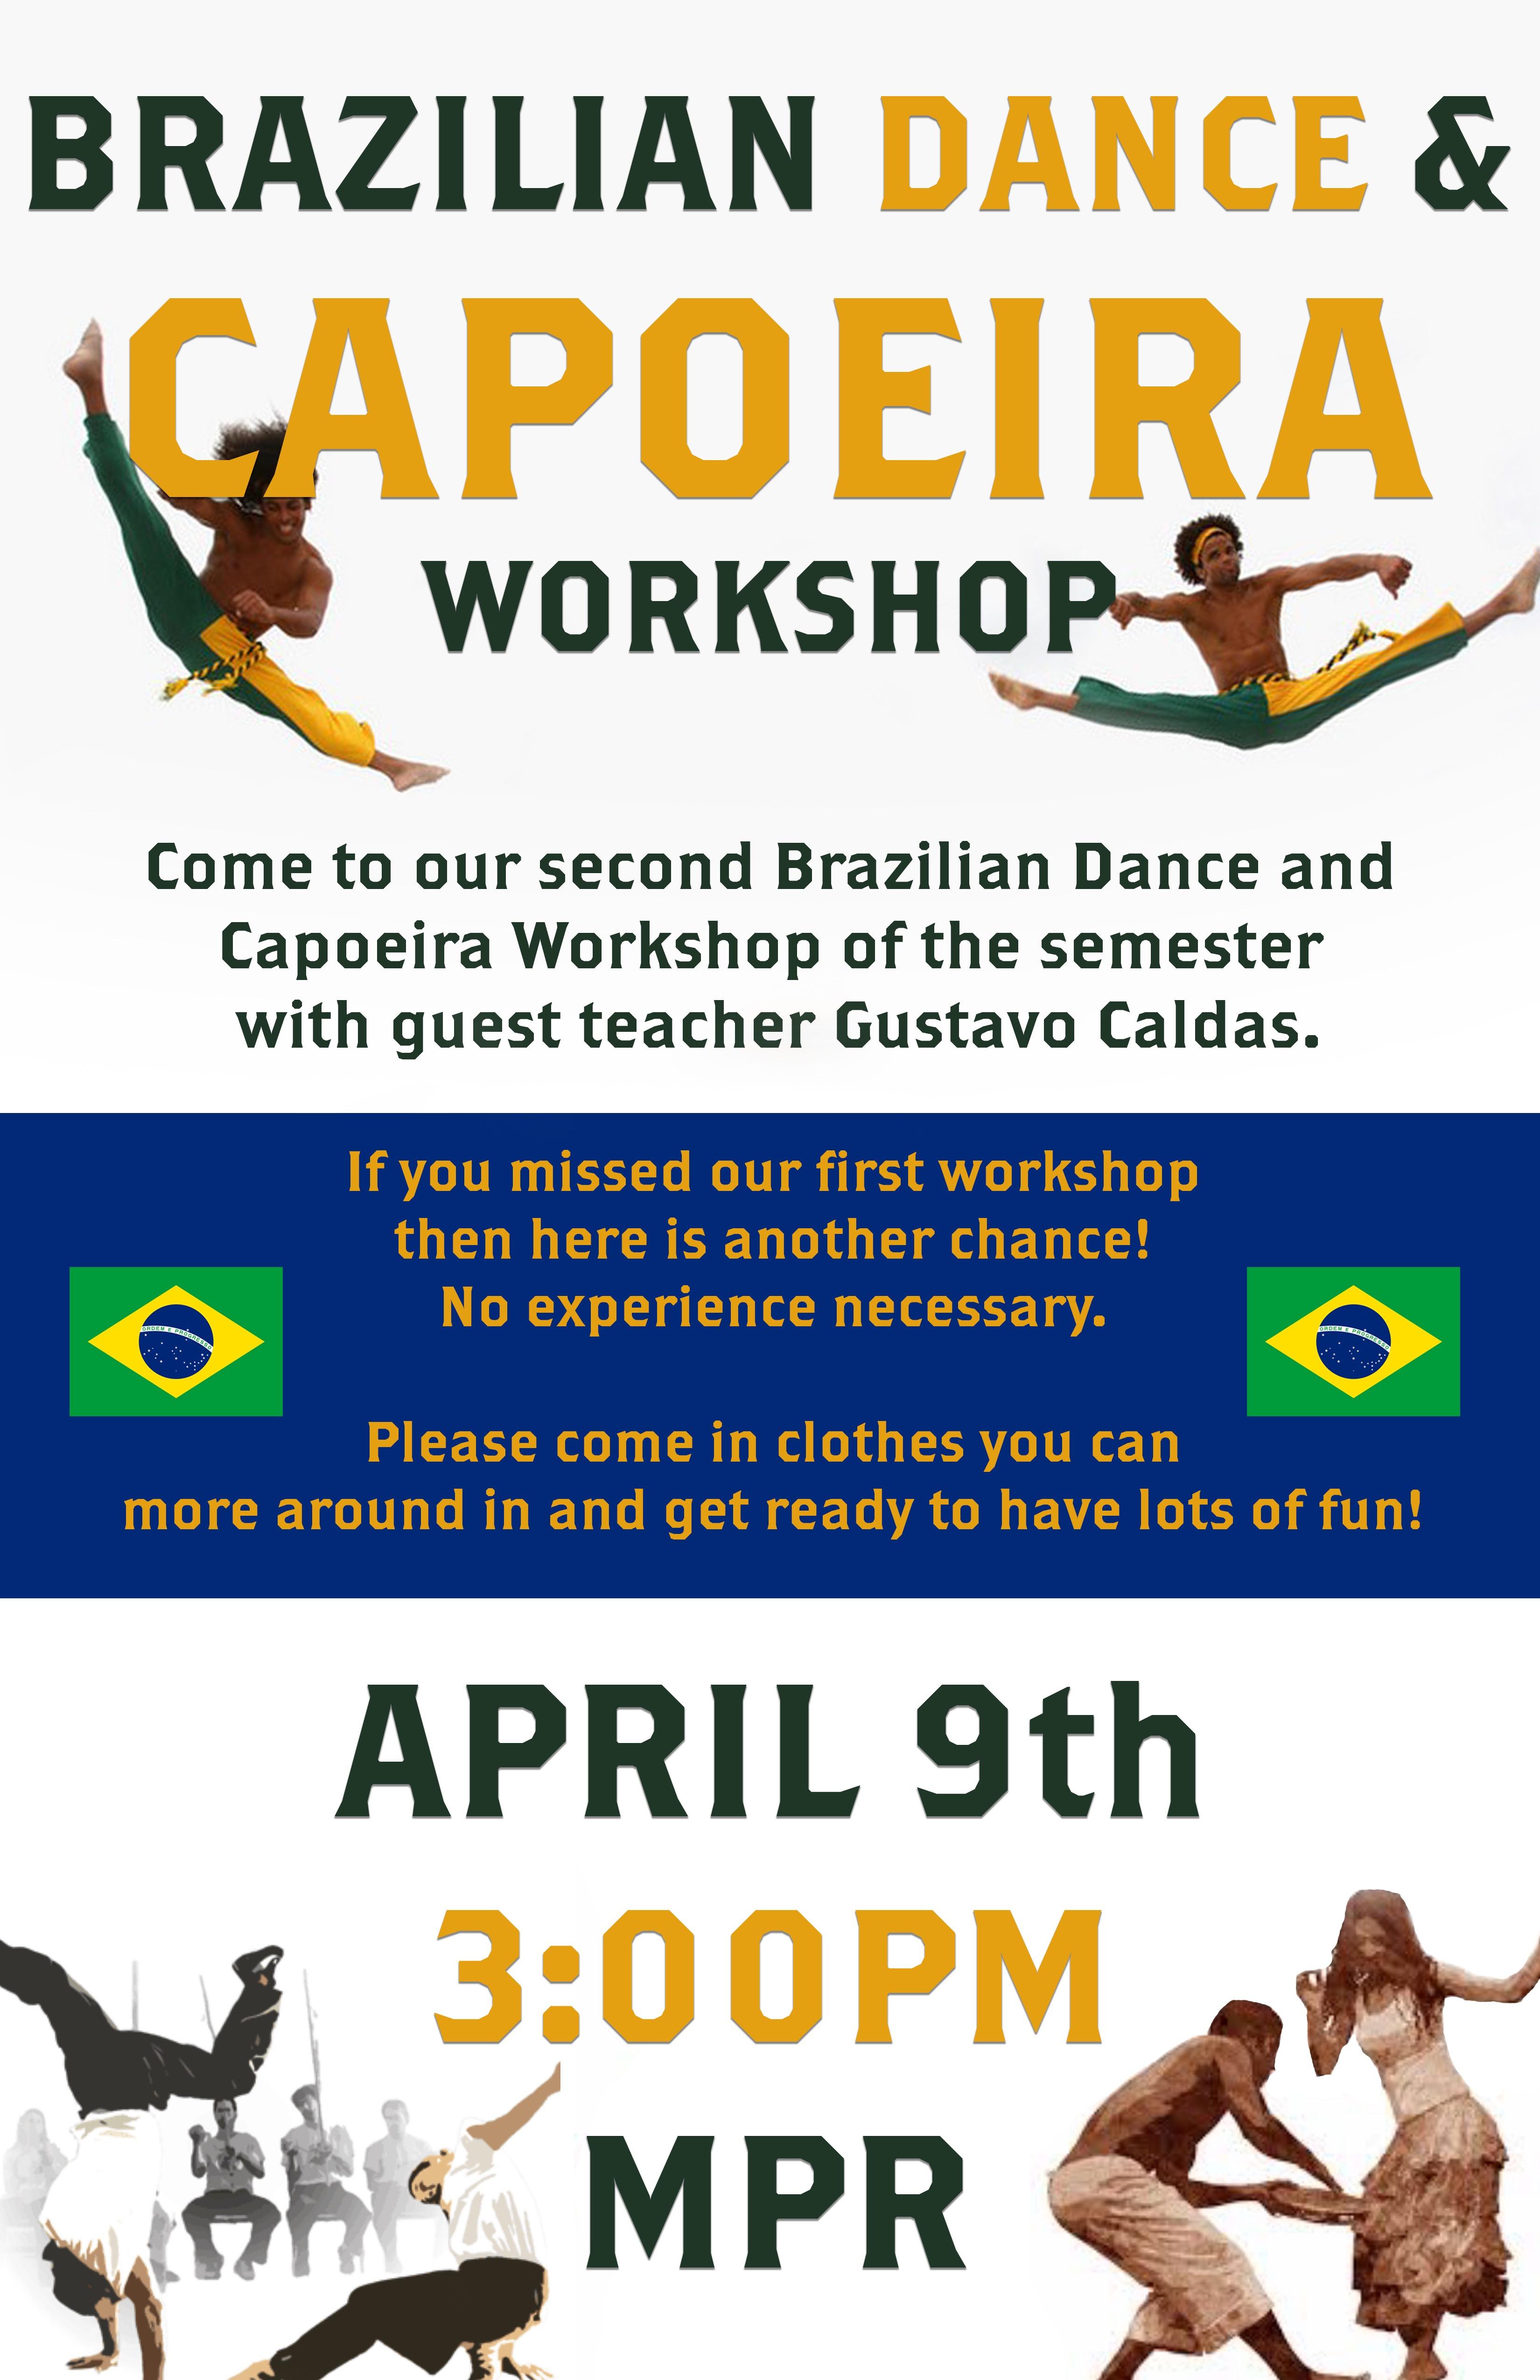 [Brazilian Dance and Capoeira Workshop - with Guest Teacher Gustavo Caldas]